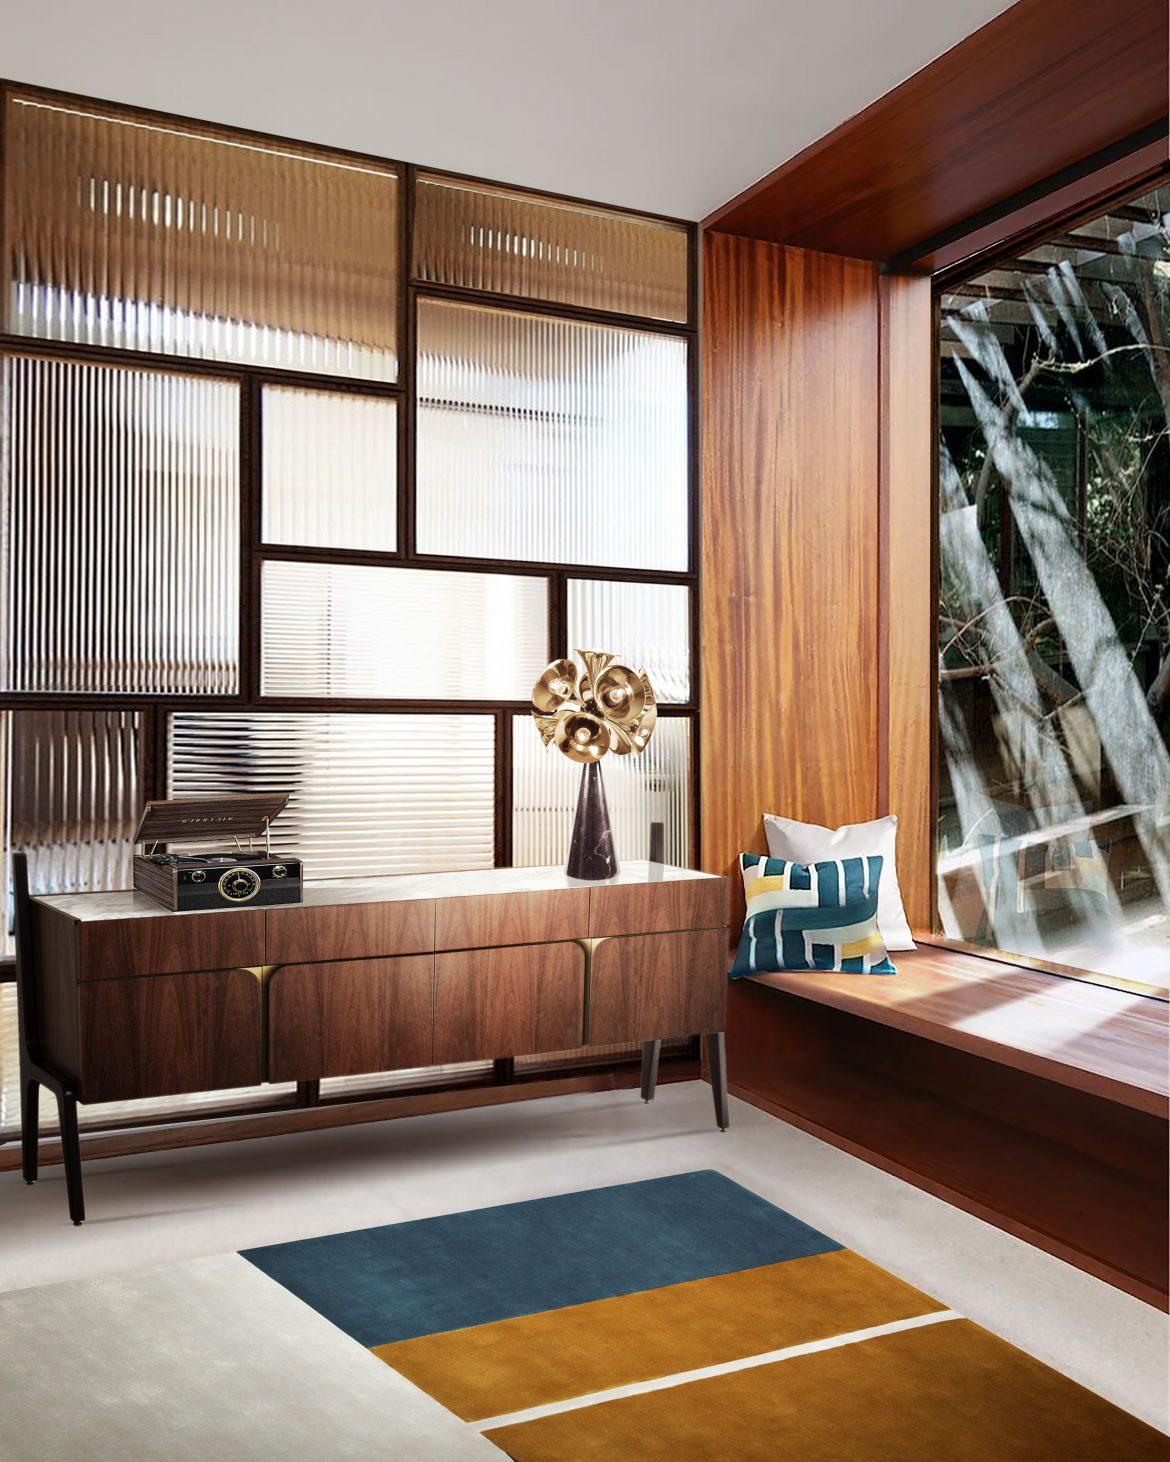 furniture online Shop Furniture Online With Interior Design Magazines shop furniture online with interior design magazines 4